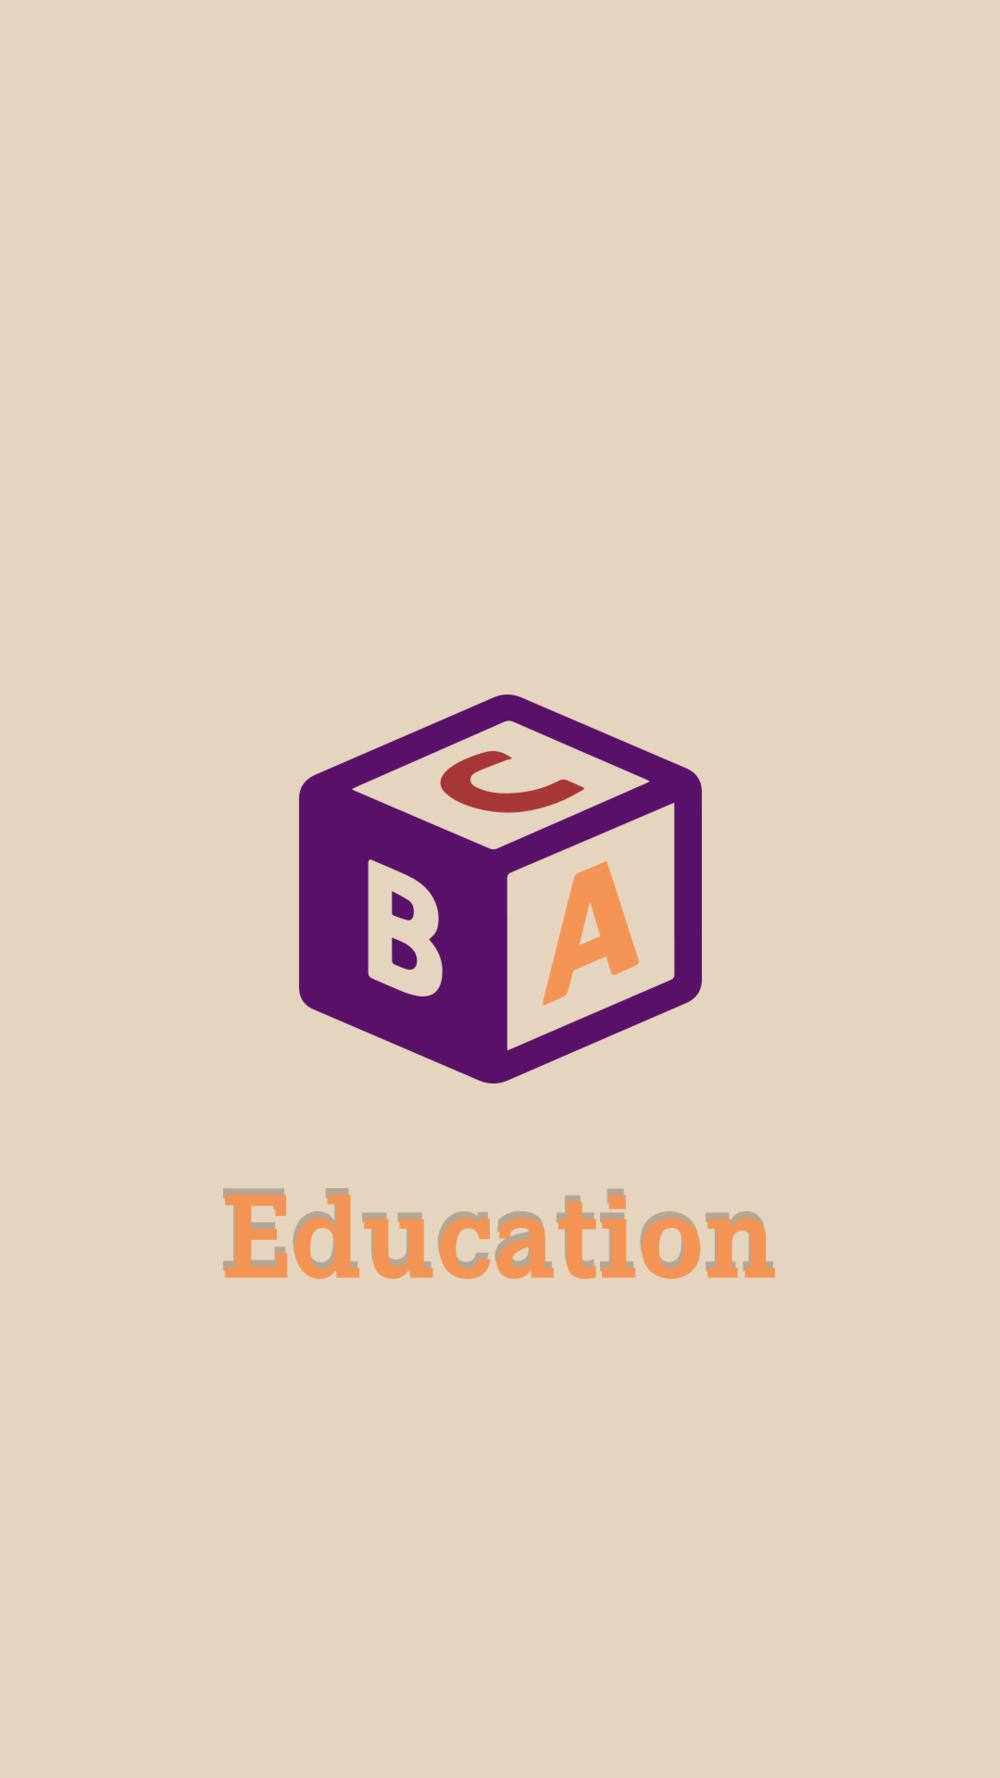 Education2 copy.png